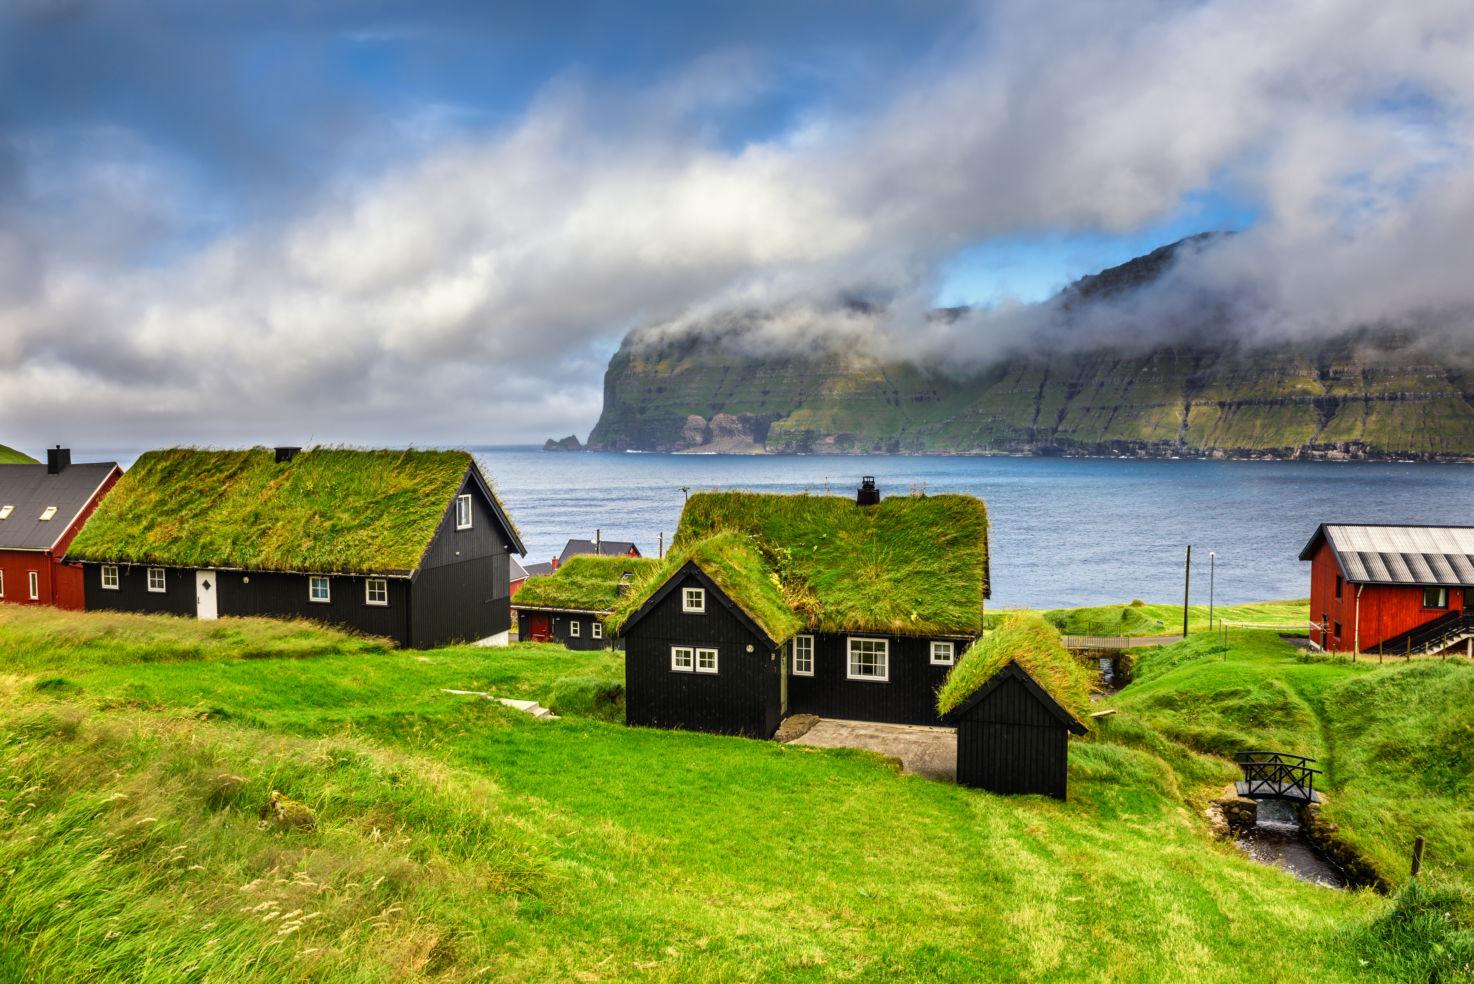 Mikladalur, Kalsoy, Faroe Islands, Denmark